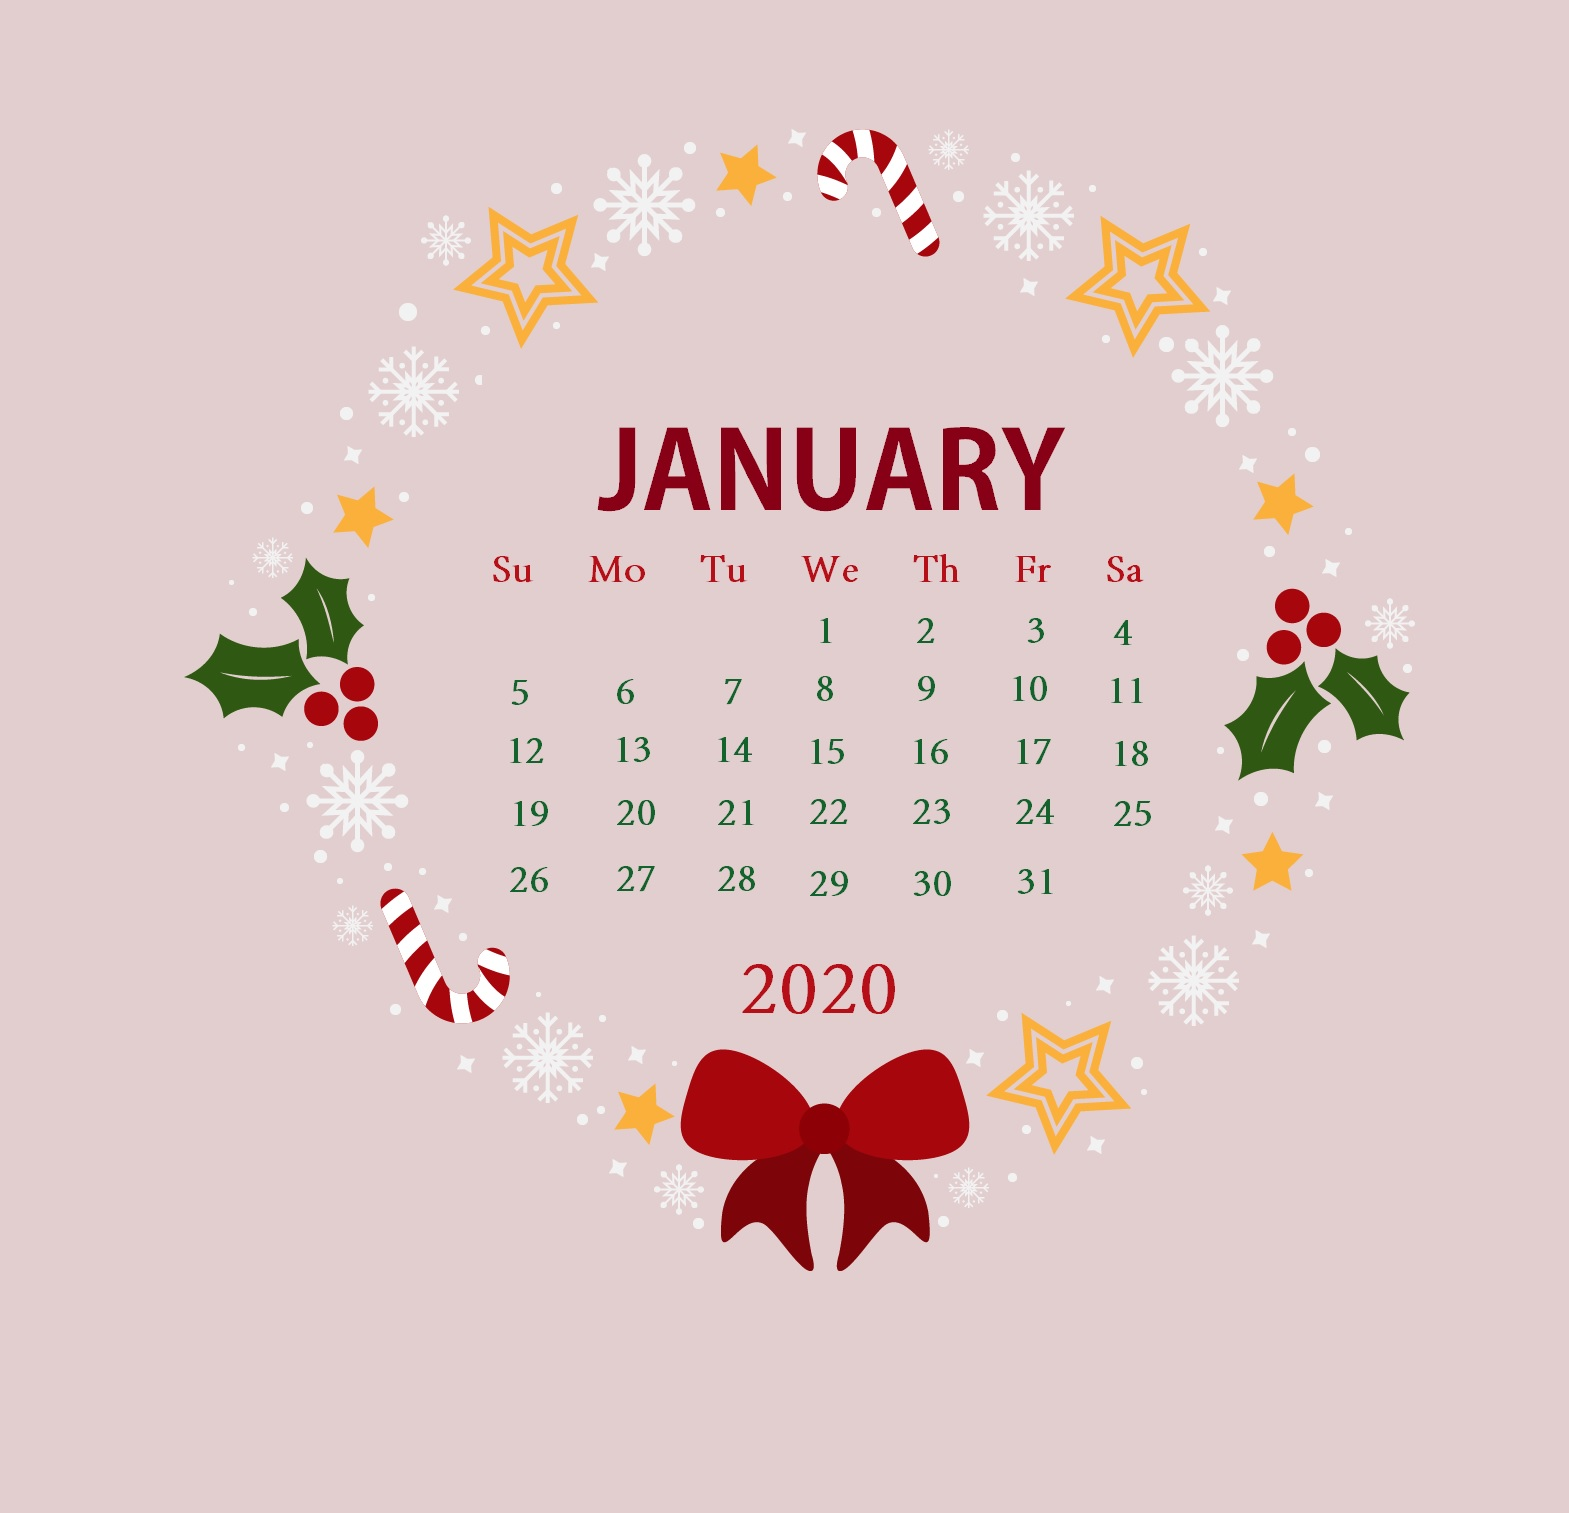 iPhone January 2020 Wallpaper Calendar Latest Calendar 1569x1513